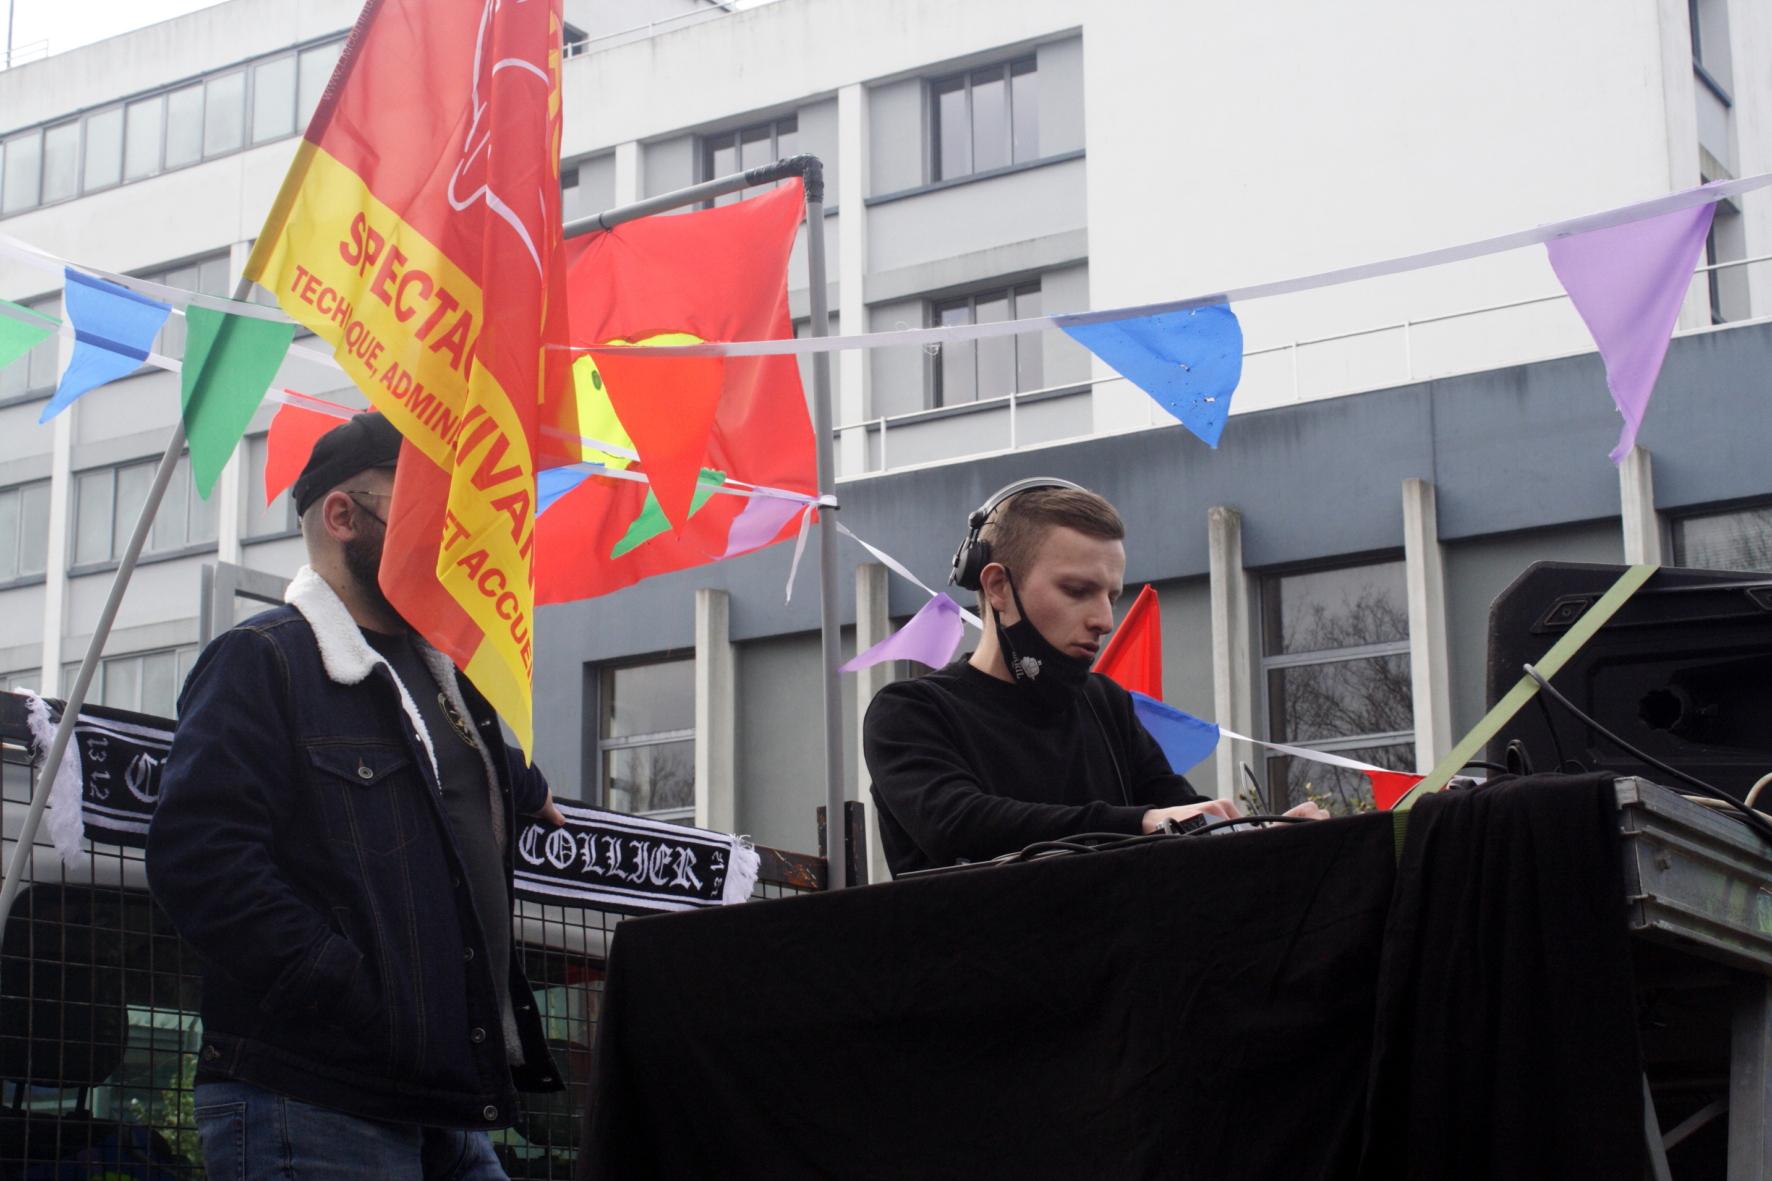 Manif-culture-Brest-20-03-21-167